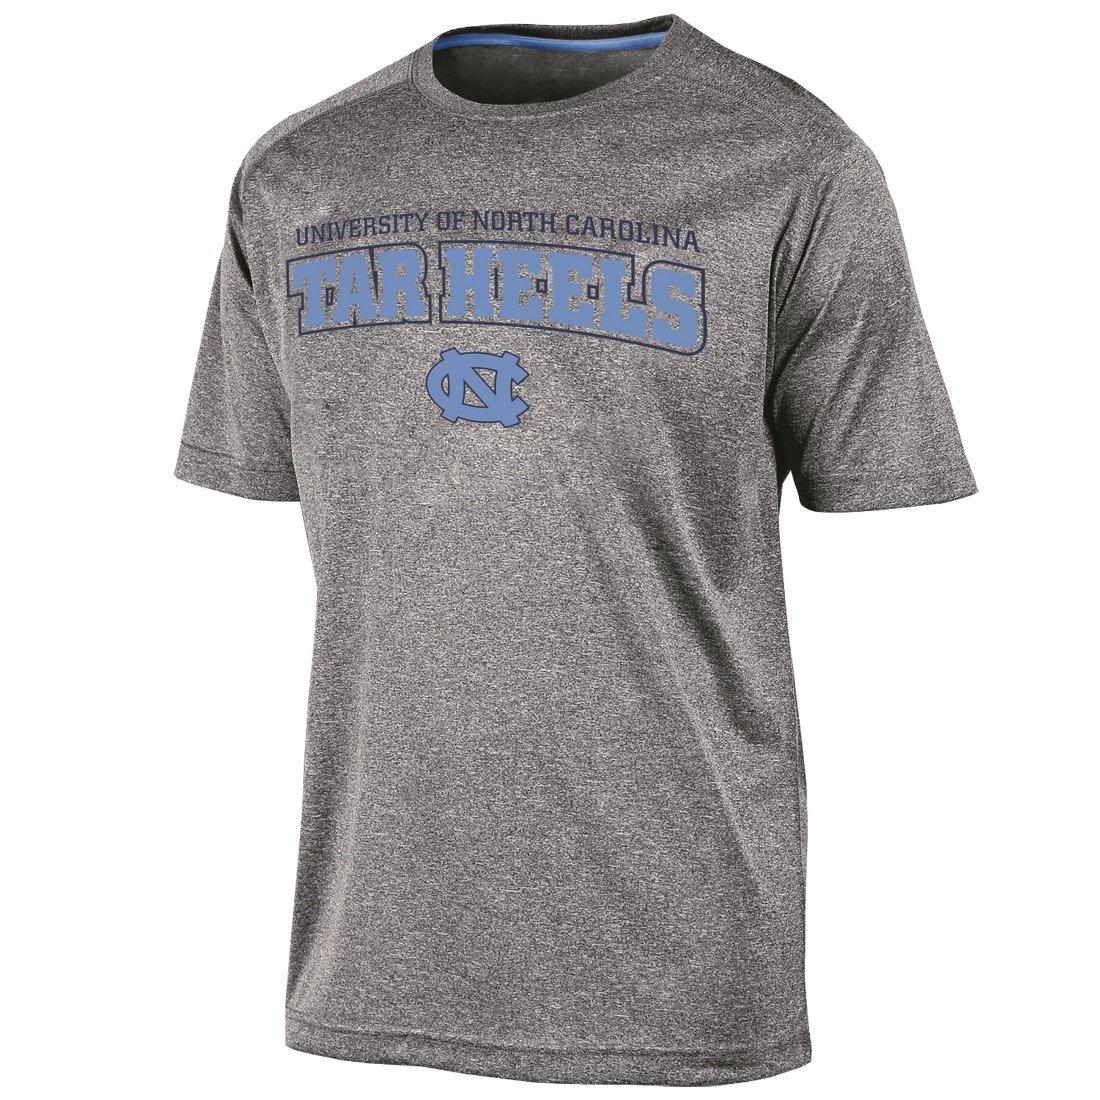 60%OFF North Carolina Tarheels NCAA Champion Impact Men s Performance S S  Shirt -. Signed Odell Beckham Jr. Jersey - JSA Certified - Autographed ... 488a00f24